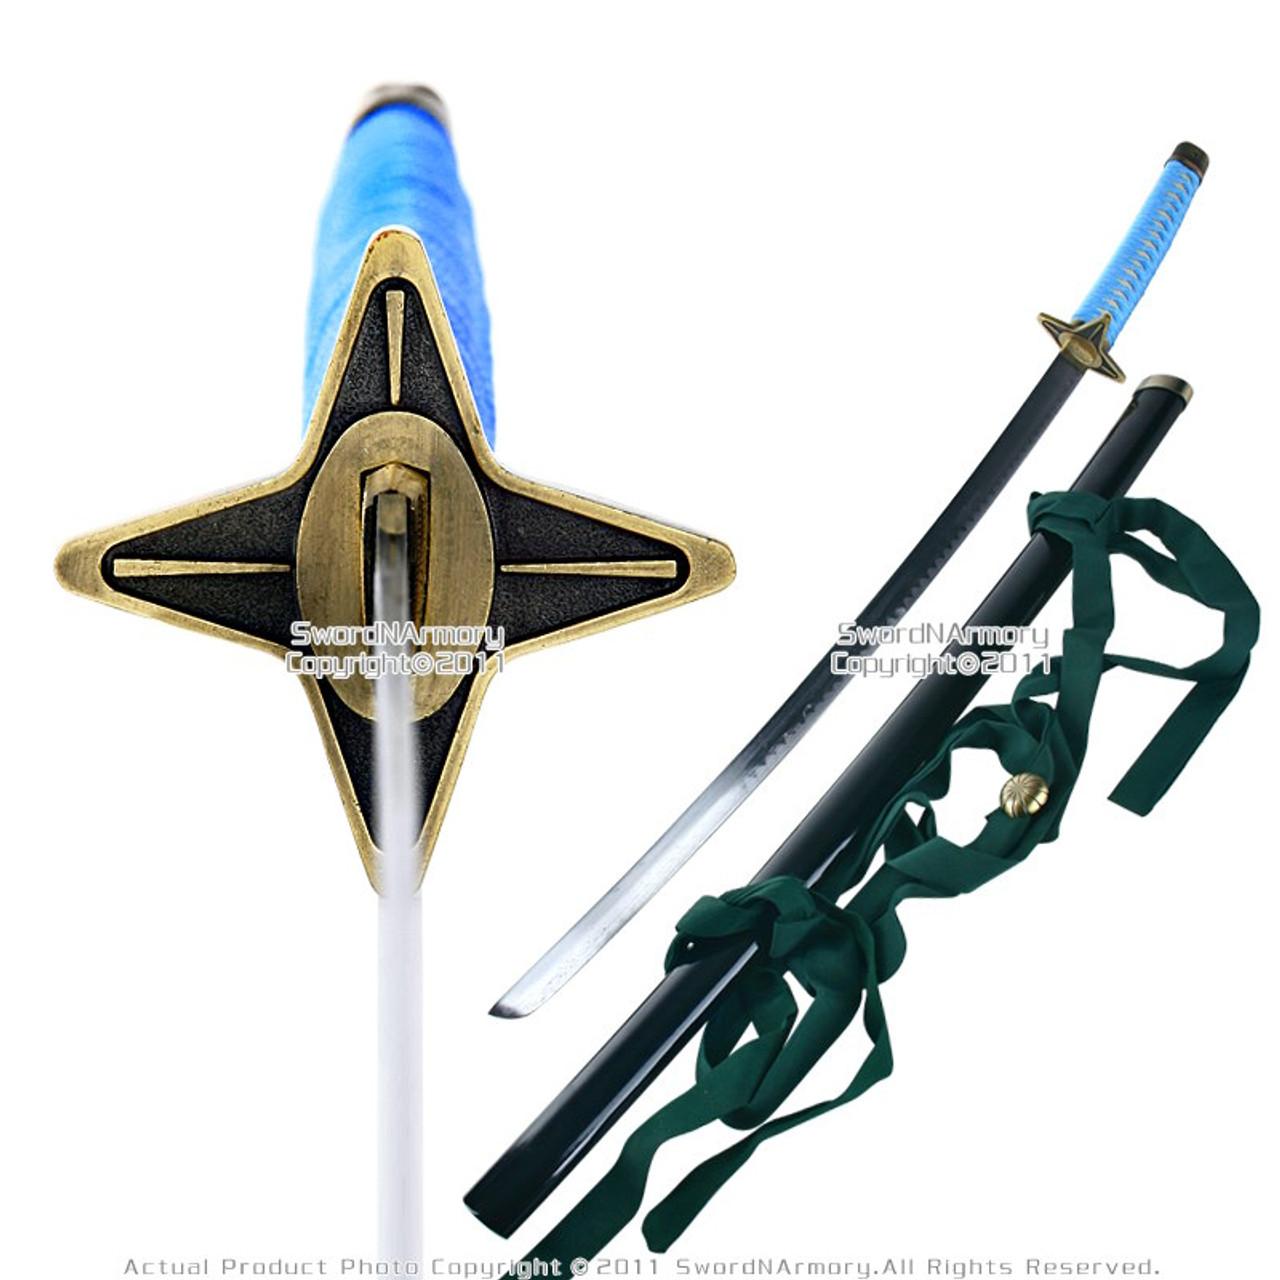 Anime Video Game Weapon Toshiro Hitsugaya Ice Ring Katana Samurai Sword